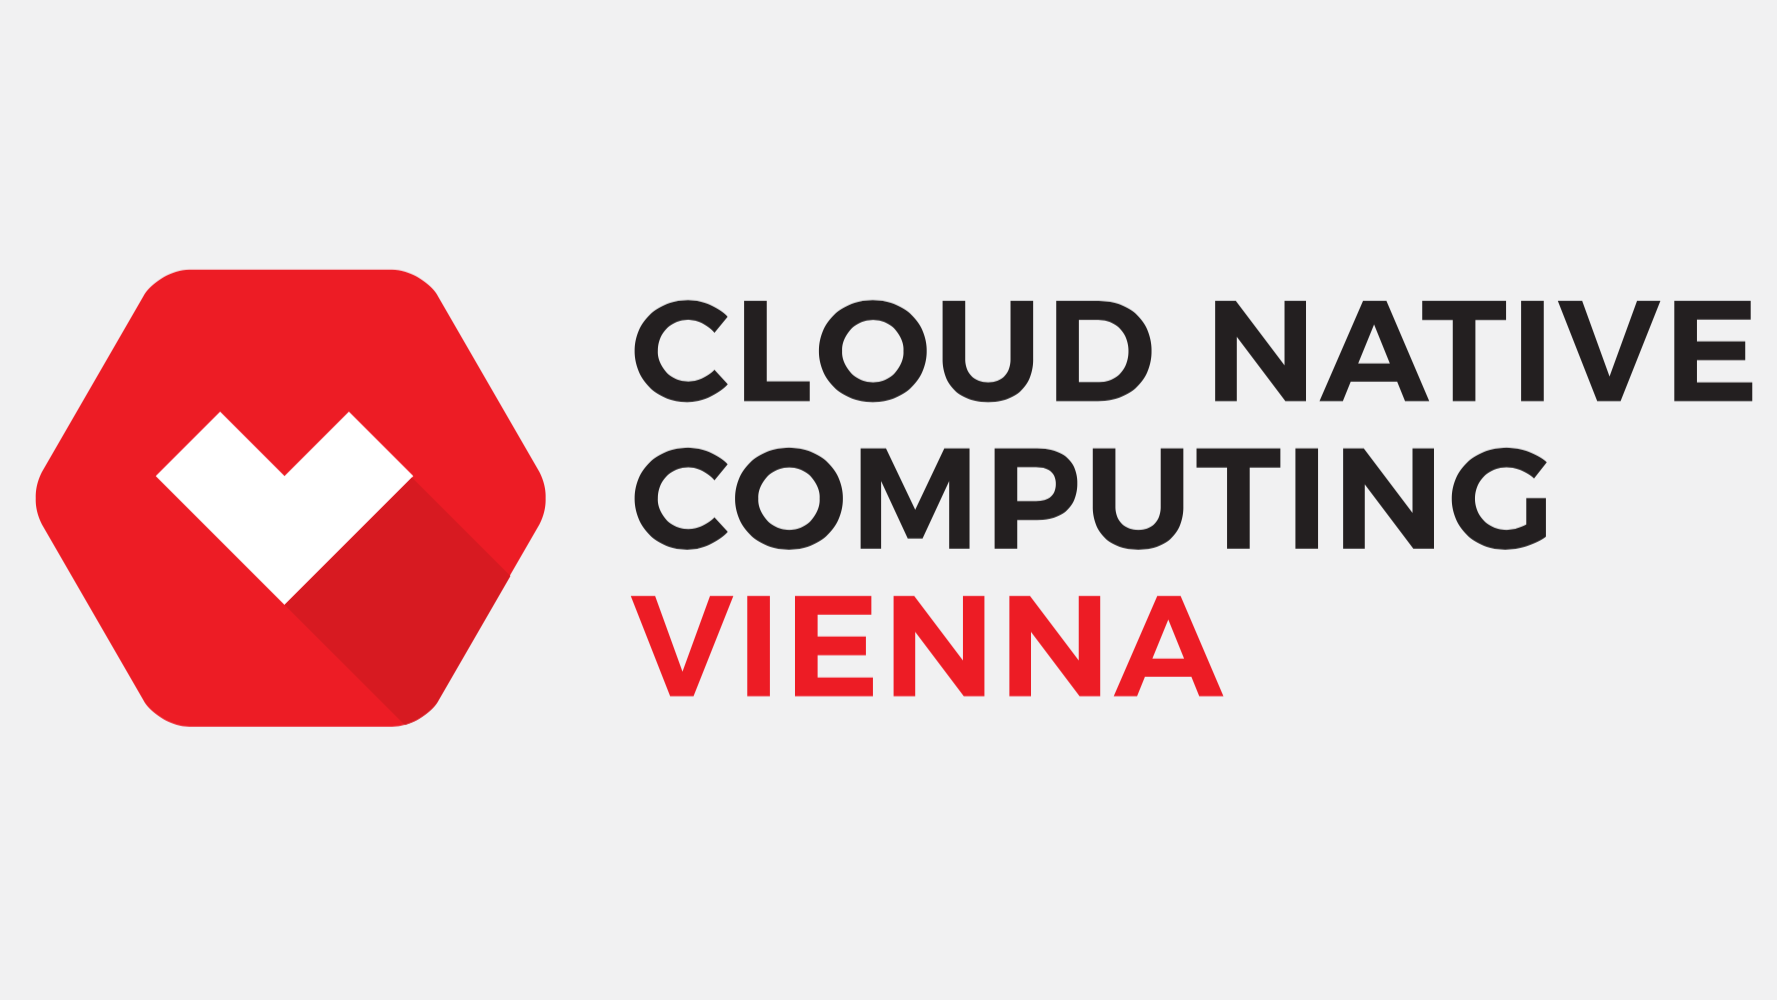 Cloud Native Computing Vienna